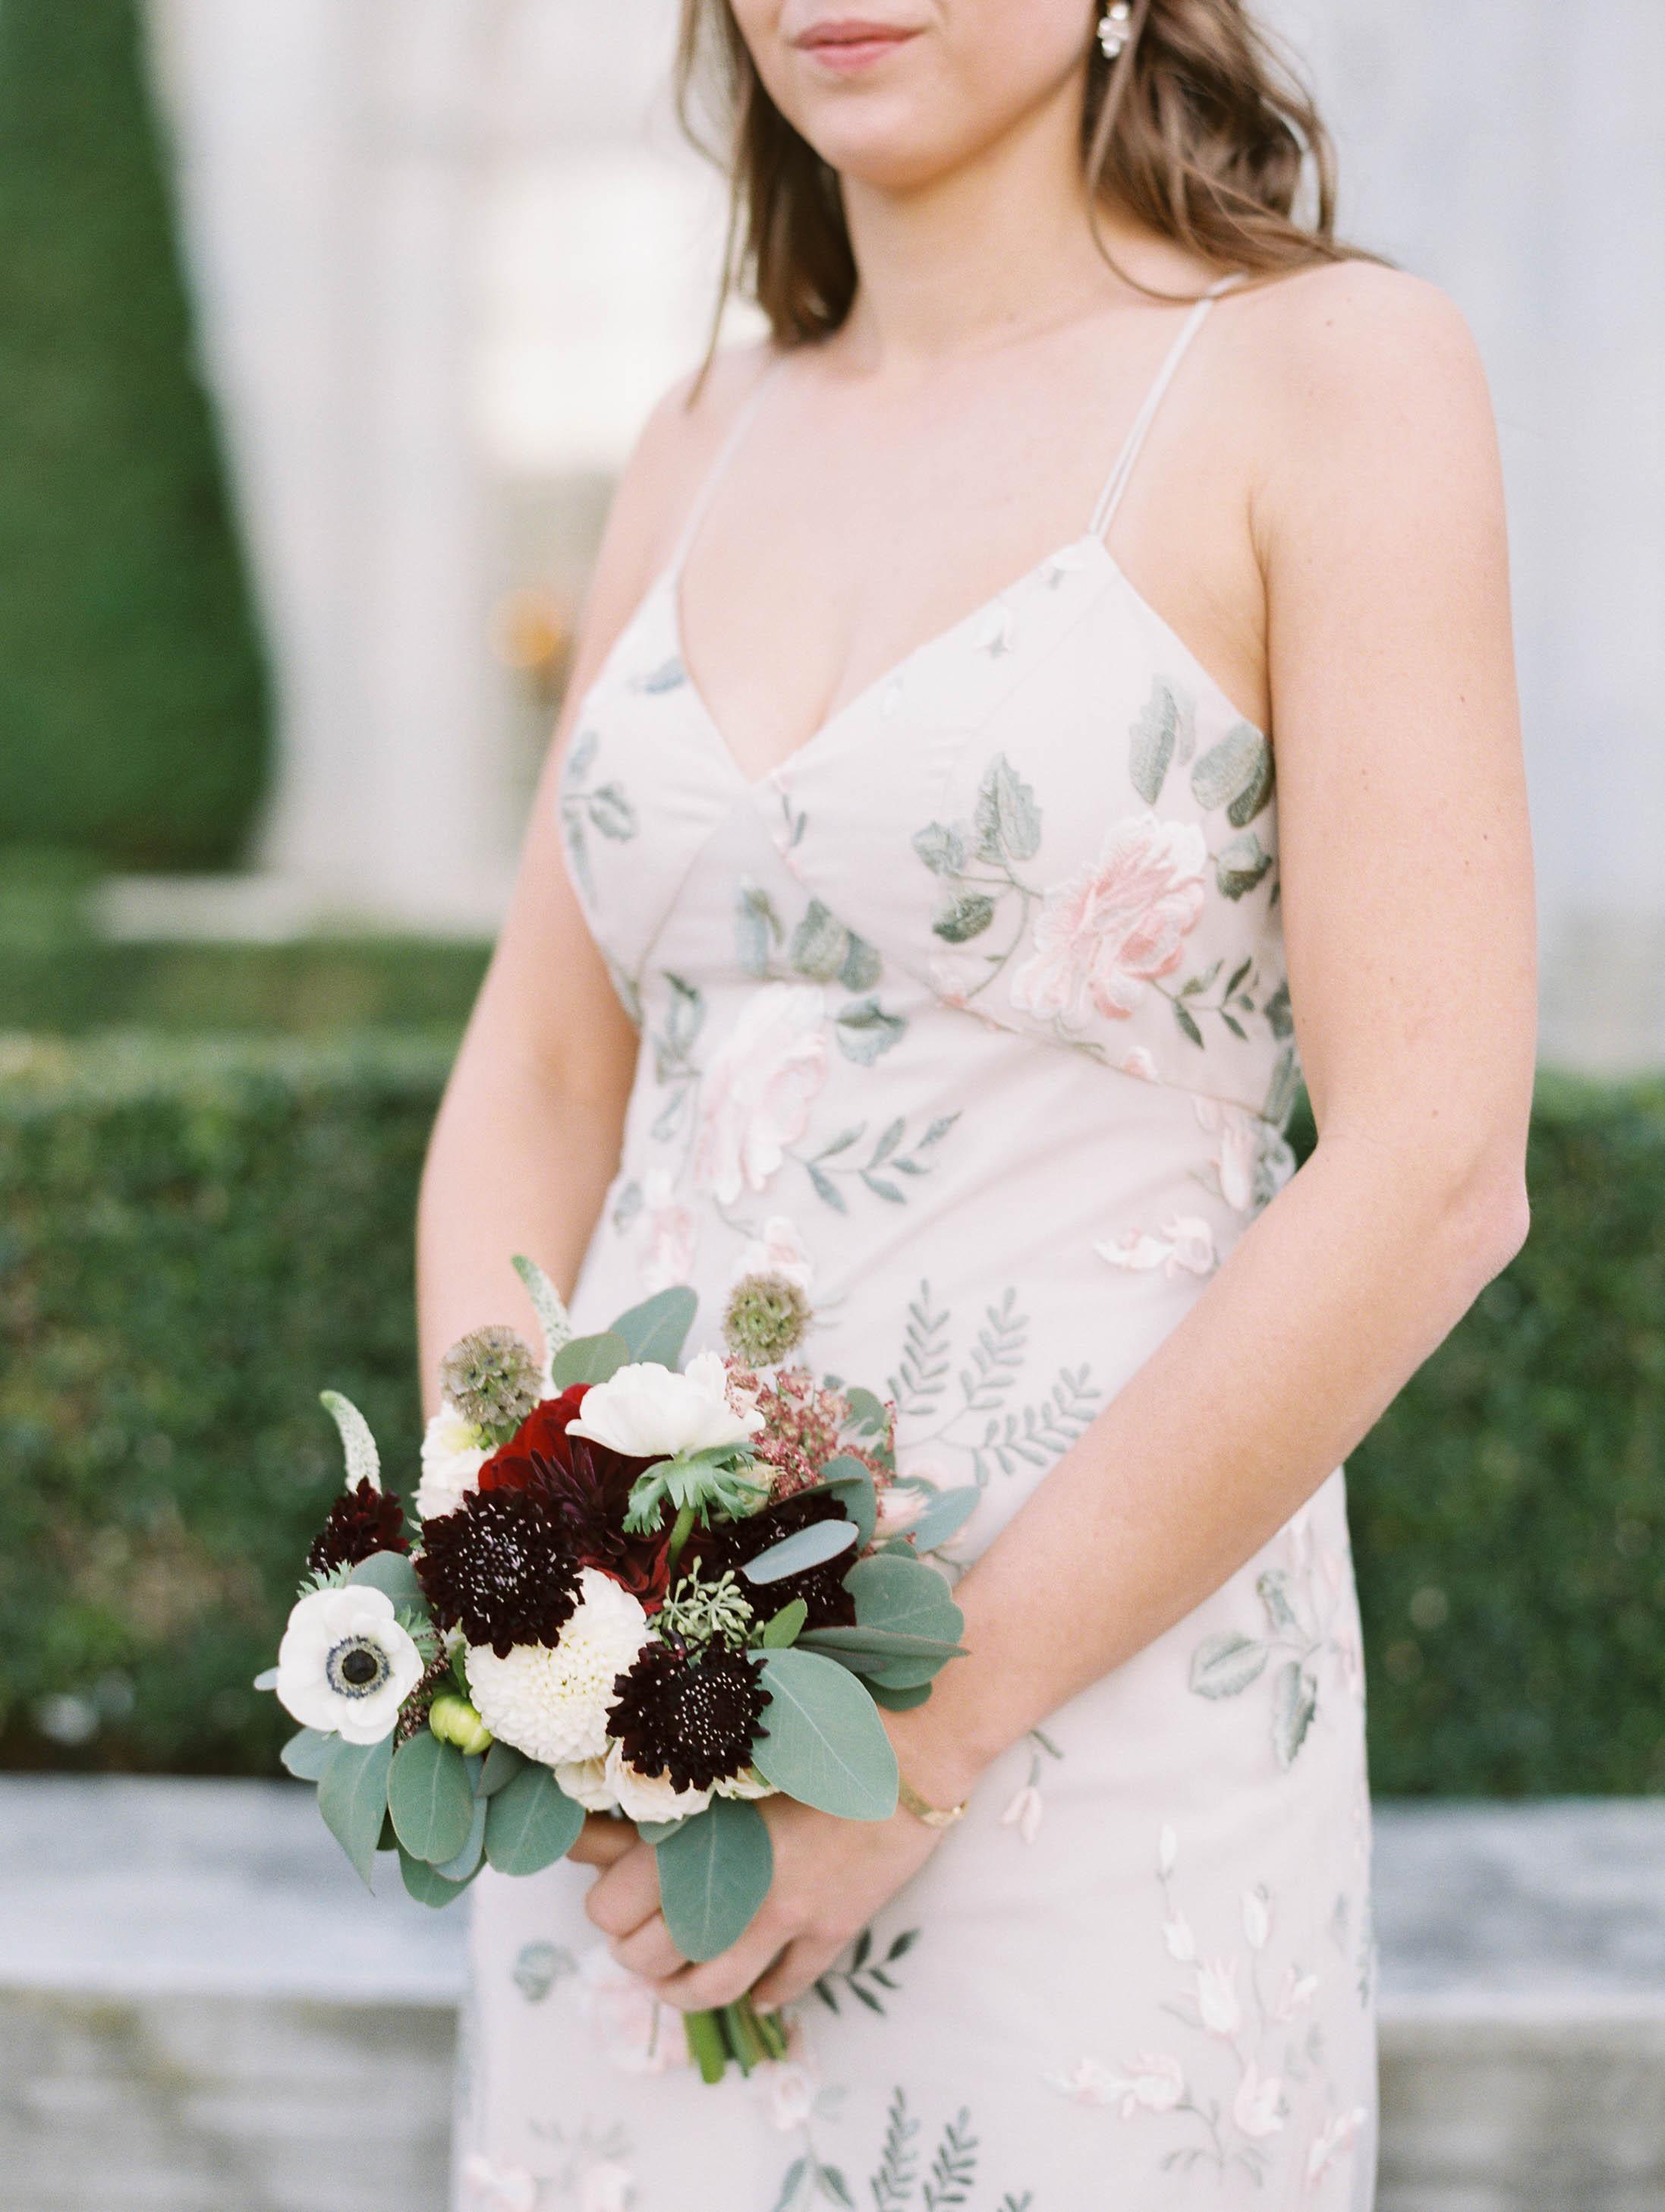 kelsandmichael_weddingphotography_rhodeislandwedding-38.jpg